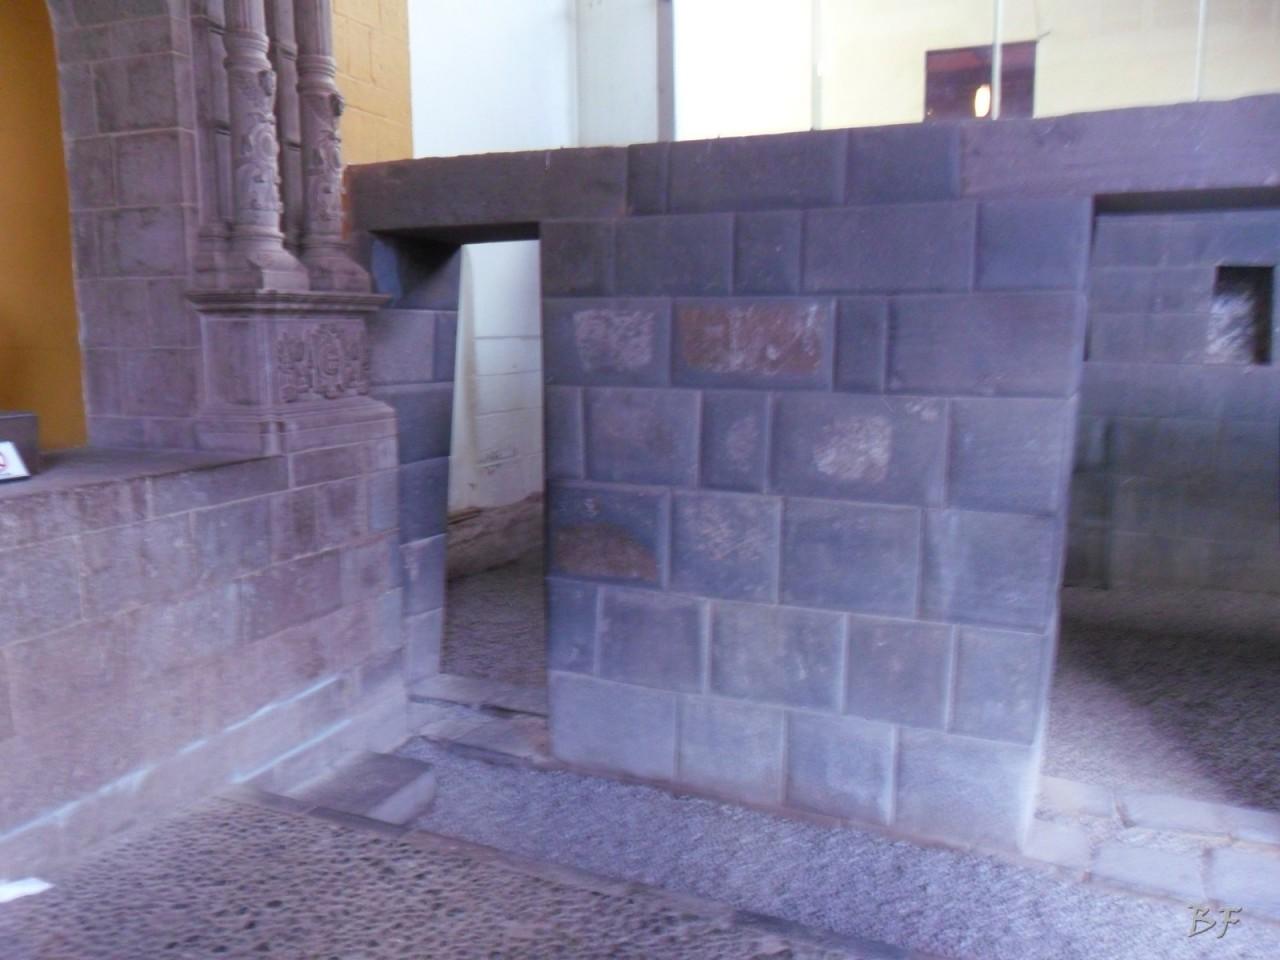 Mura-Poligonali-Megaliti-Tempio-Coricancha-Cusco-Perù-21